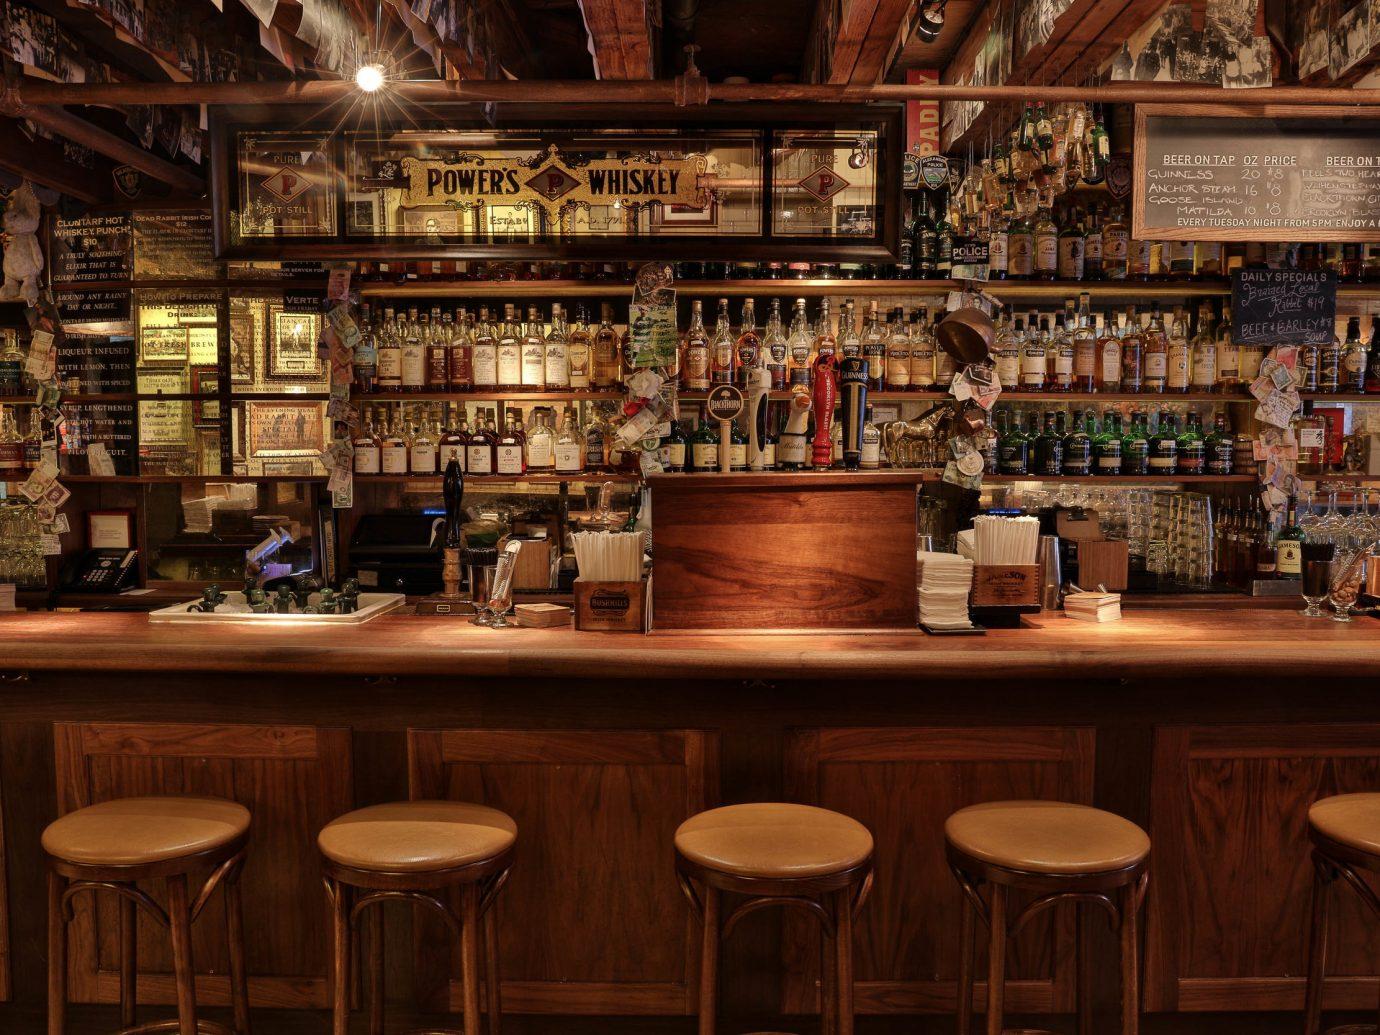 Food + Drink indoor Bar shelf tavern pub liquor store restaurant interior design café cluttered